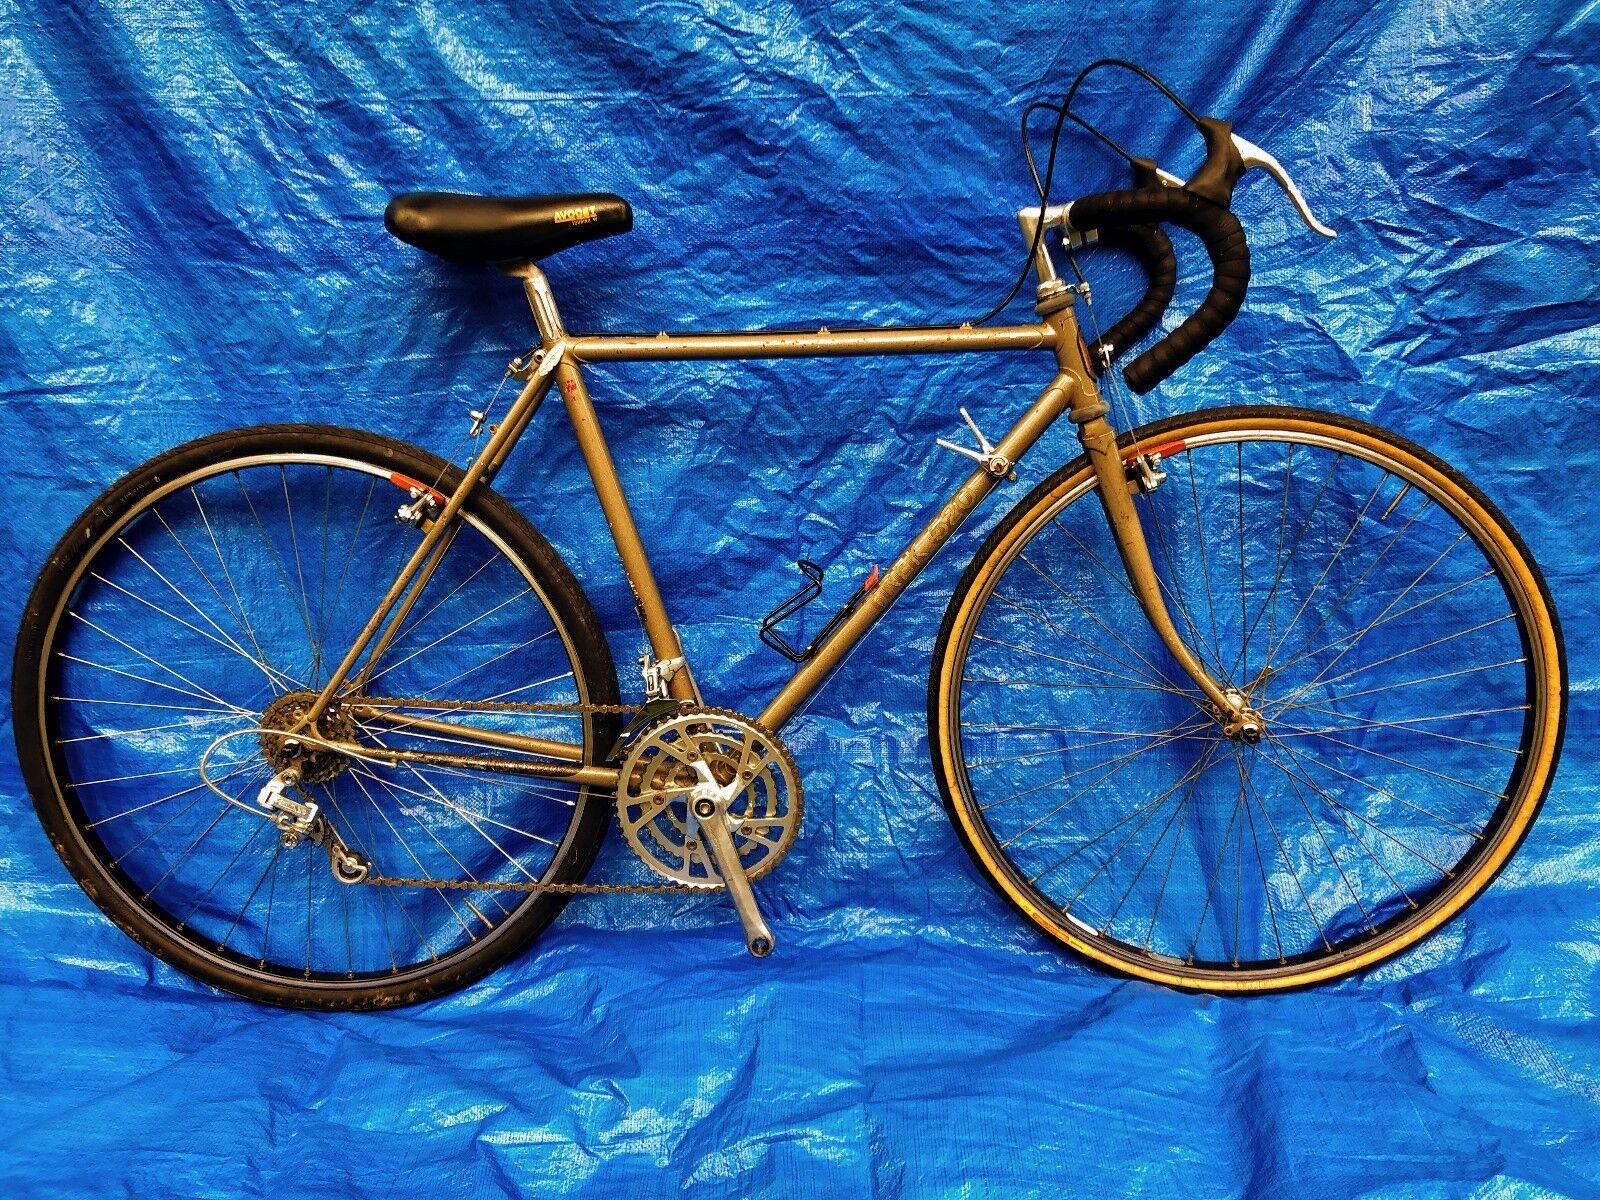 30b53b0ea68 1984 Trek 520 Touring Bike, 21-inch / 53 cm